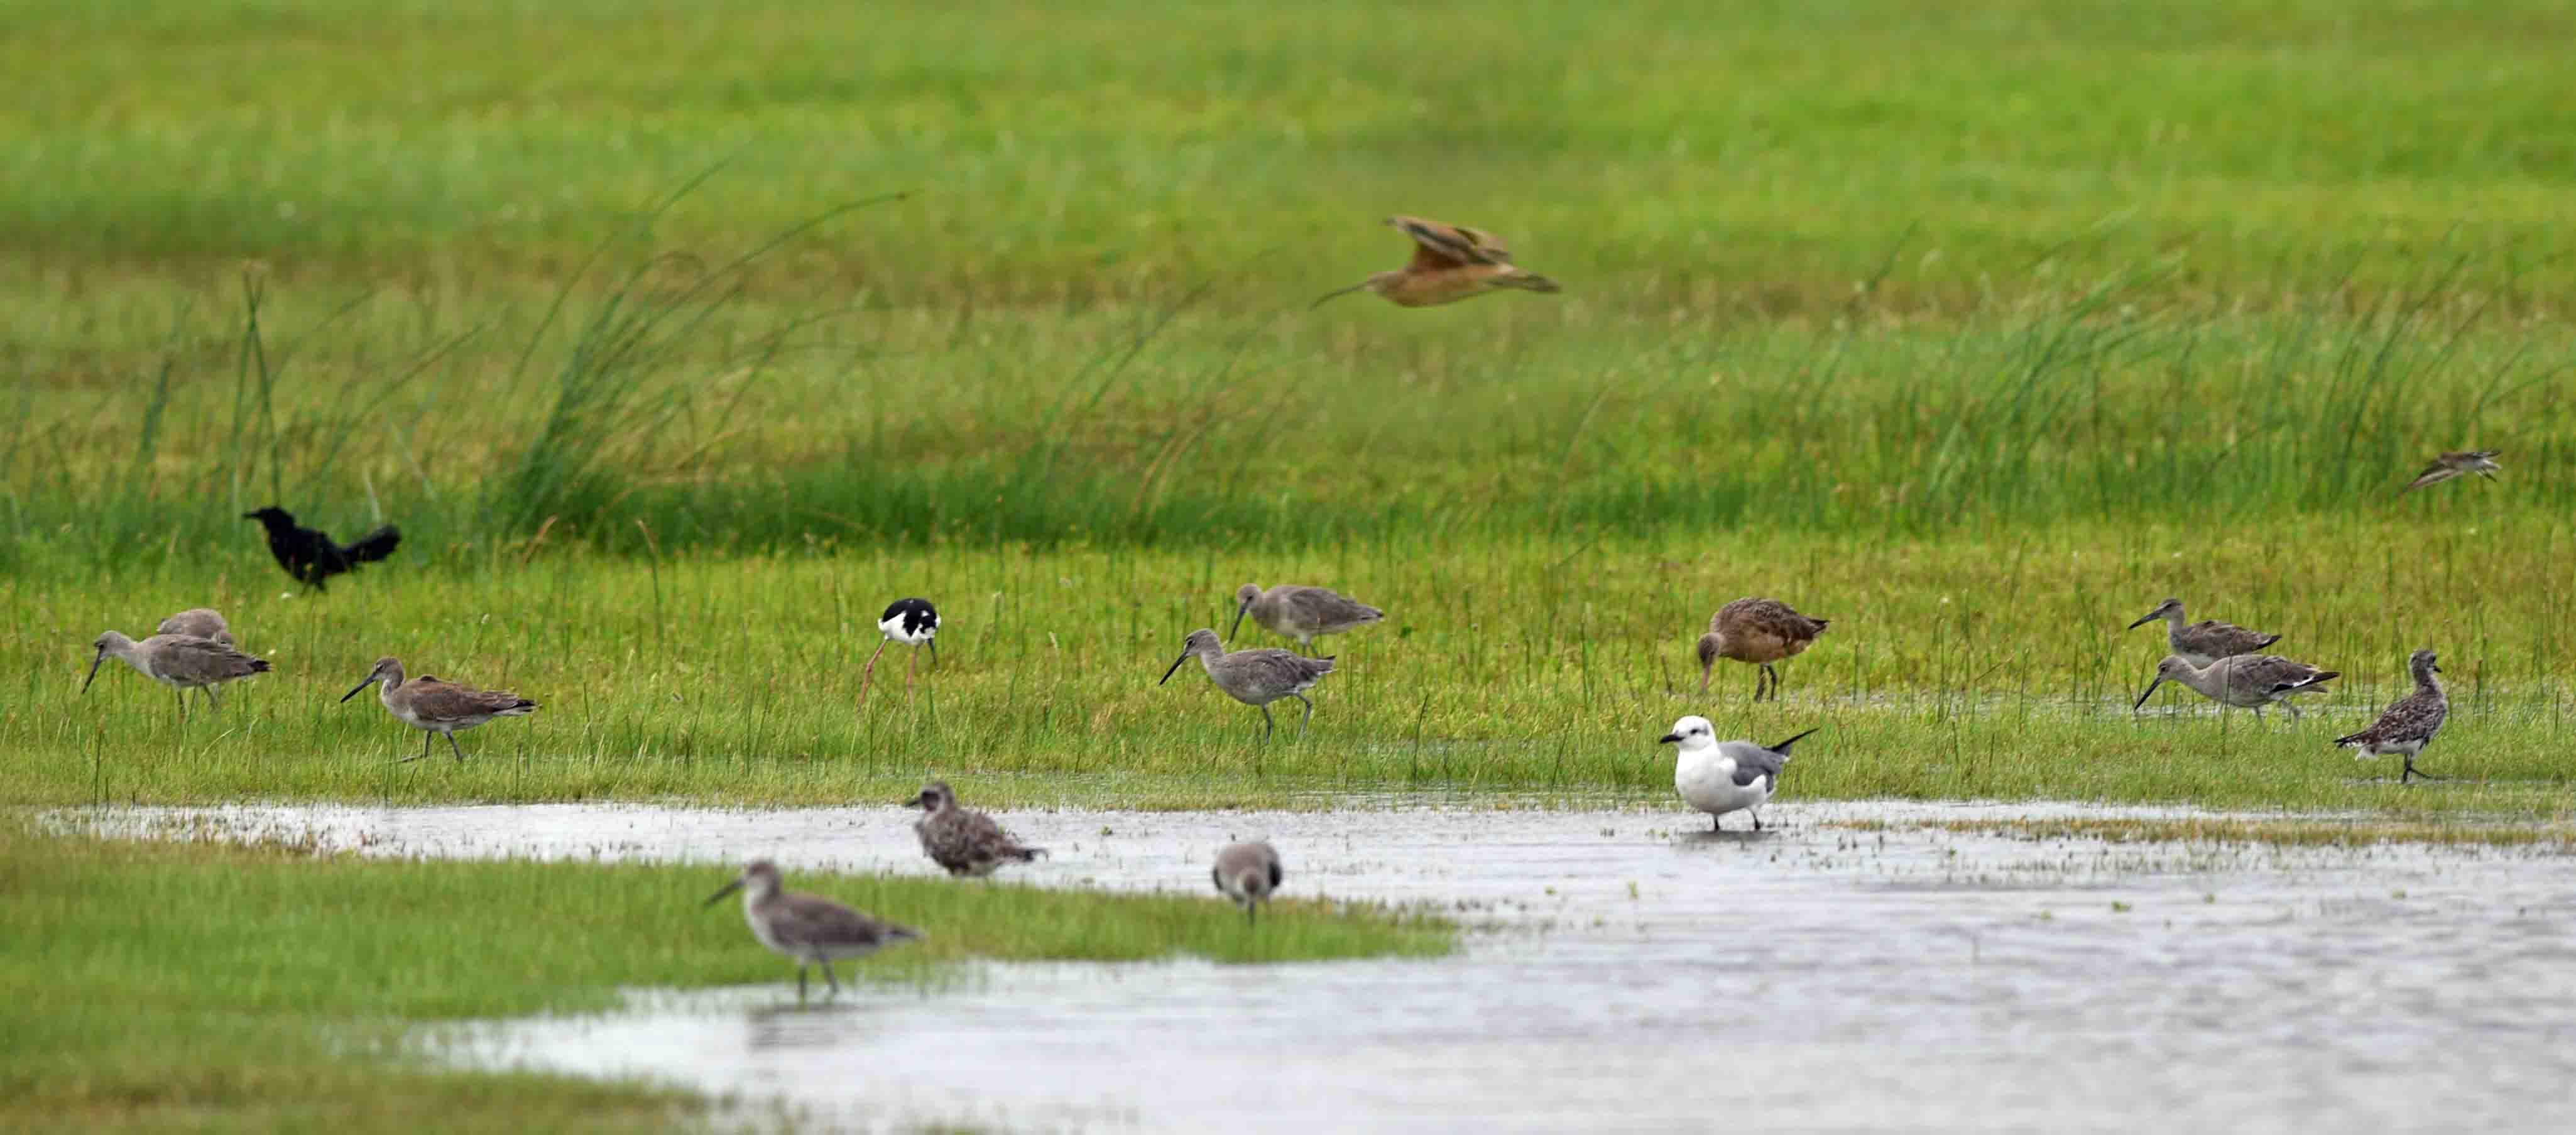 shorebirds galveston bay hurricane harvey